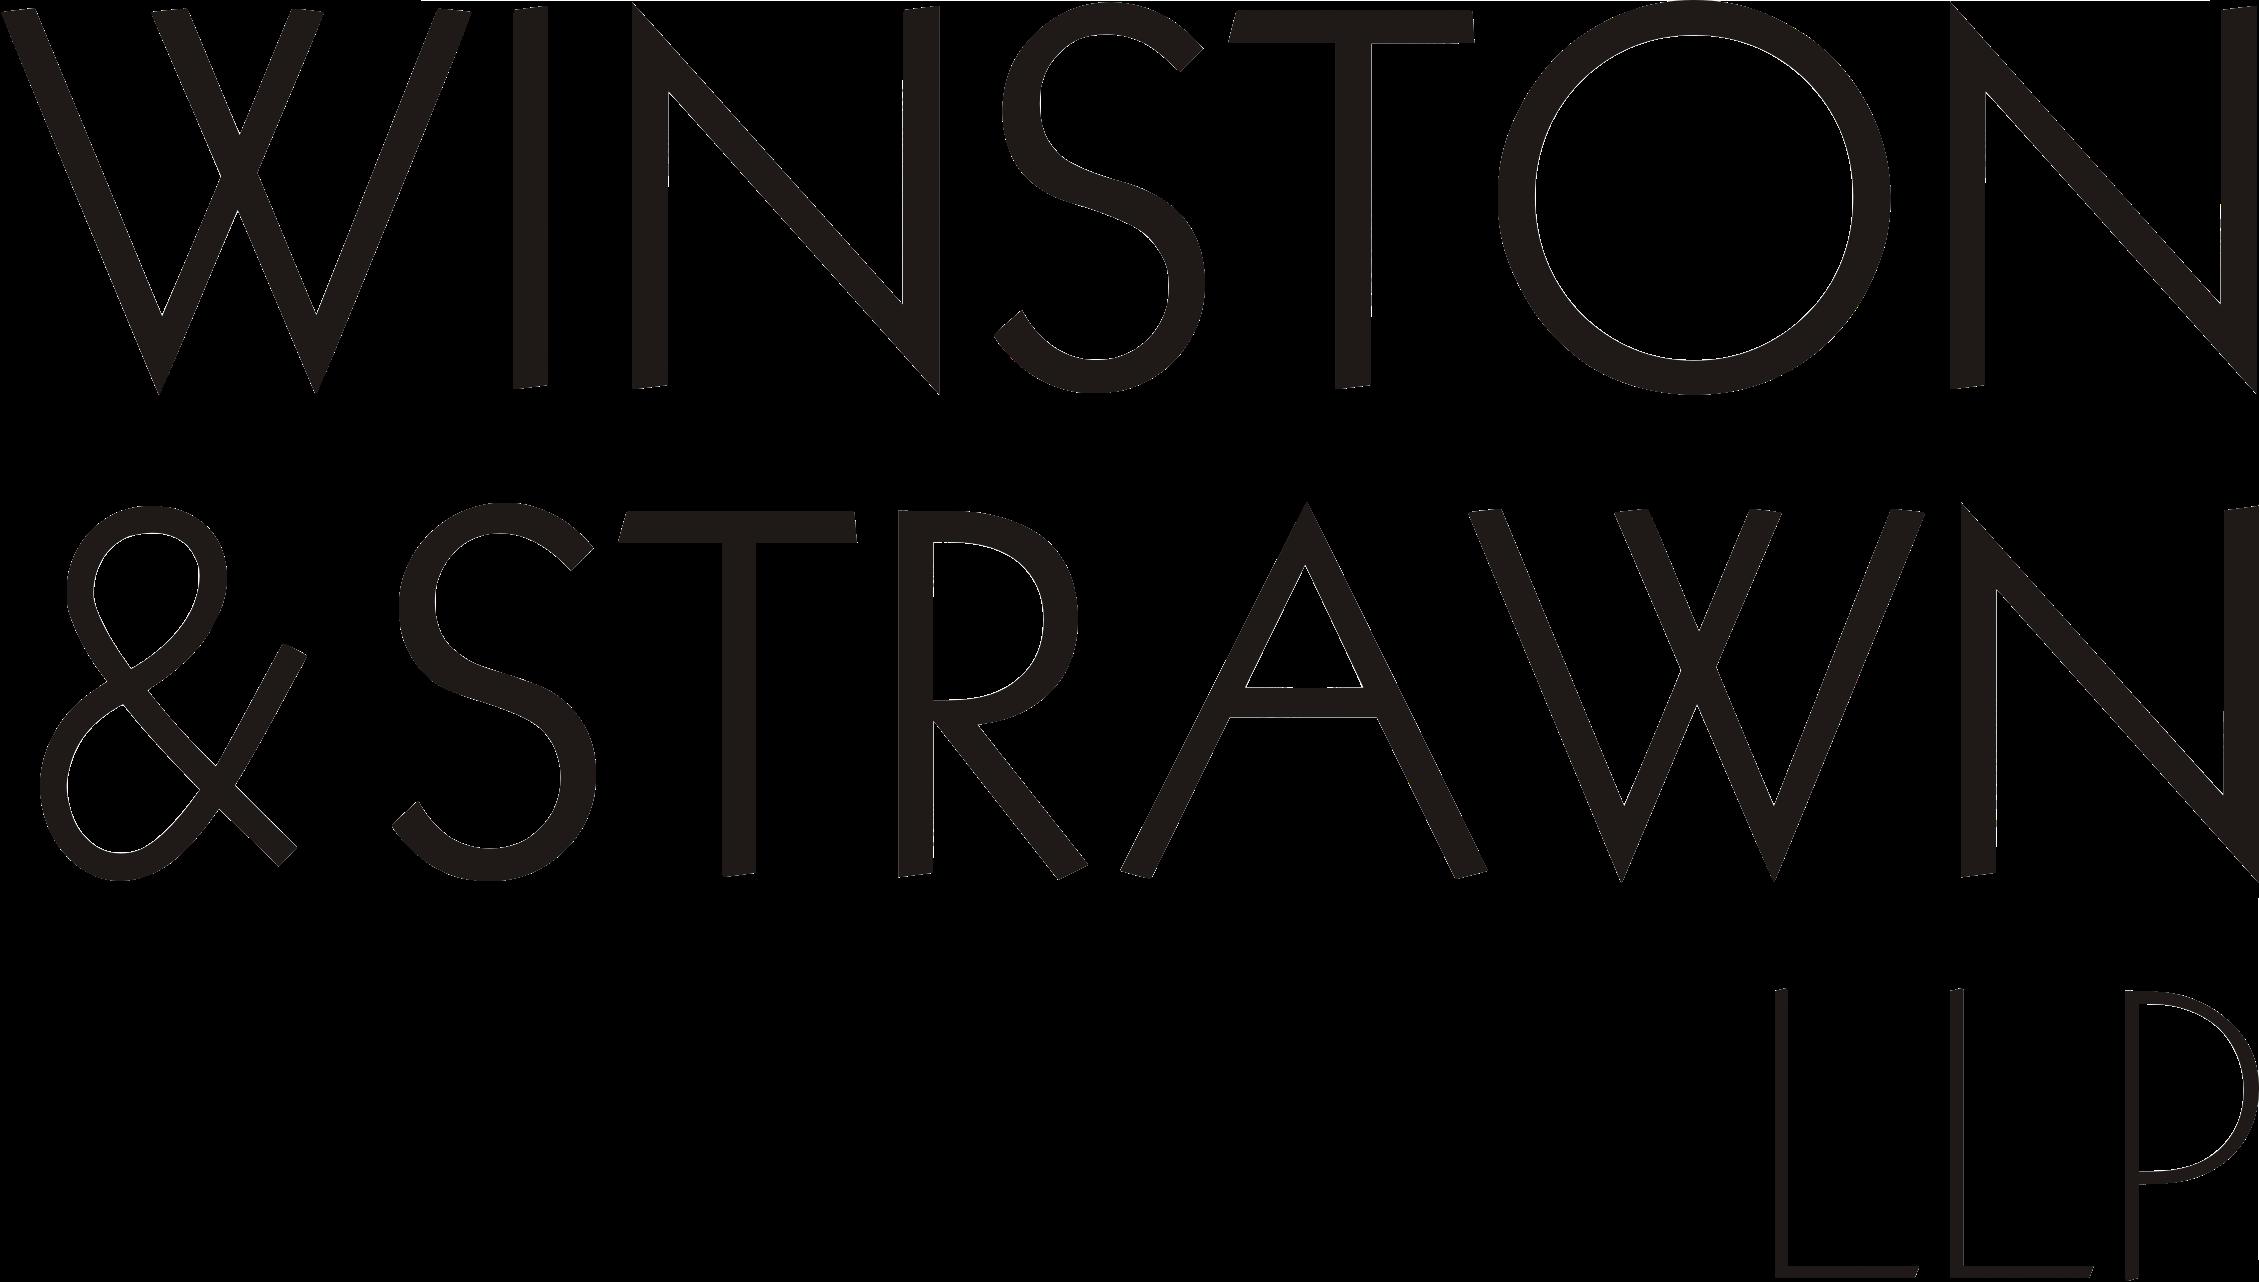 winston-strawn-logo